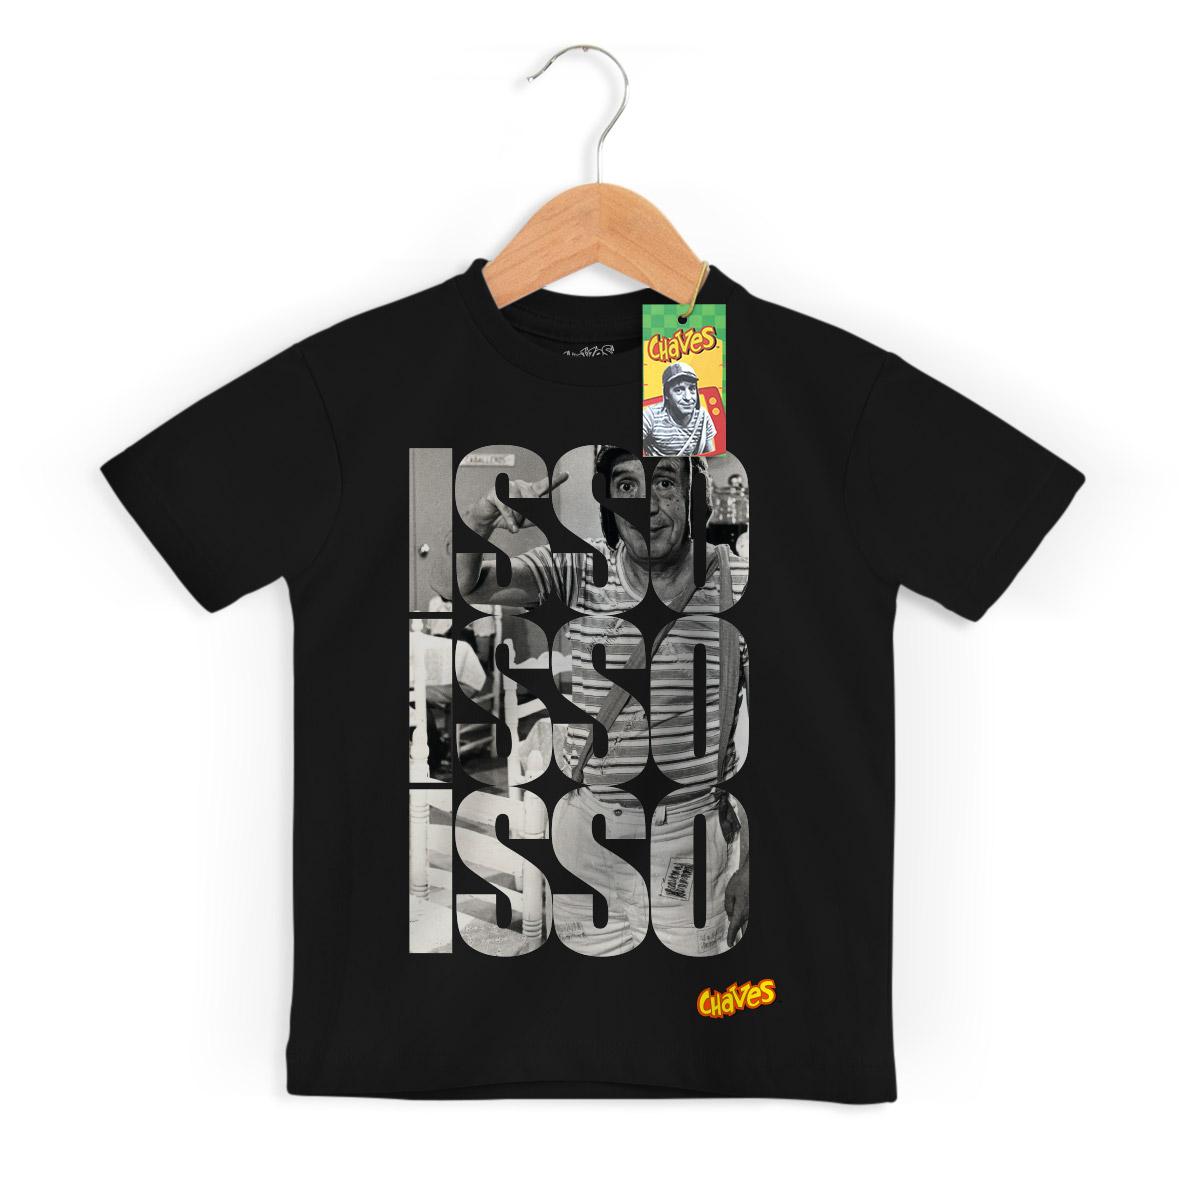 Camiseta Infantil Chaves Isso! Isso! Isso! Black